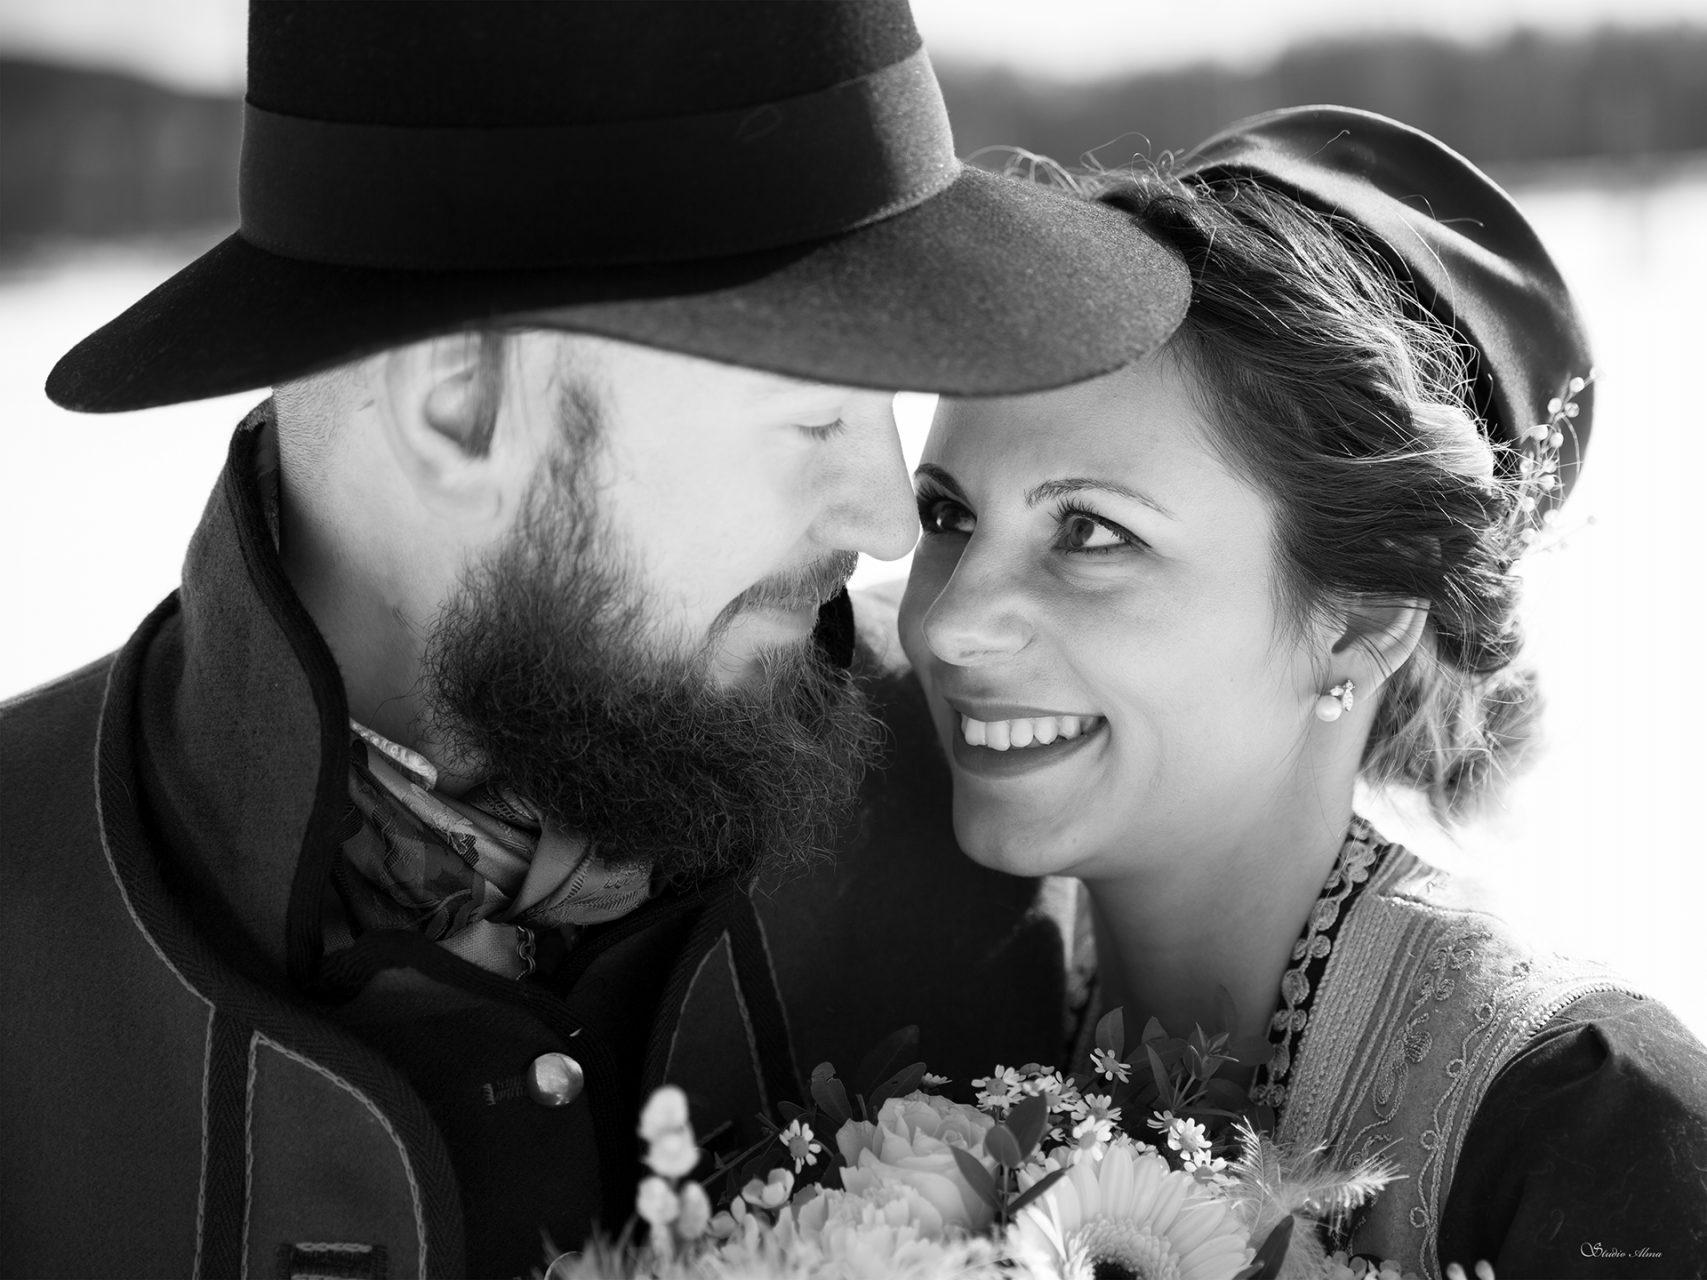 brudepar-brud-brudgom-fotograf-studioalma